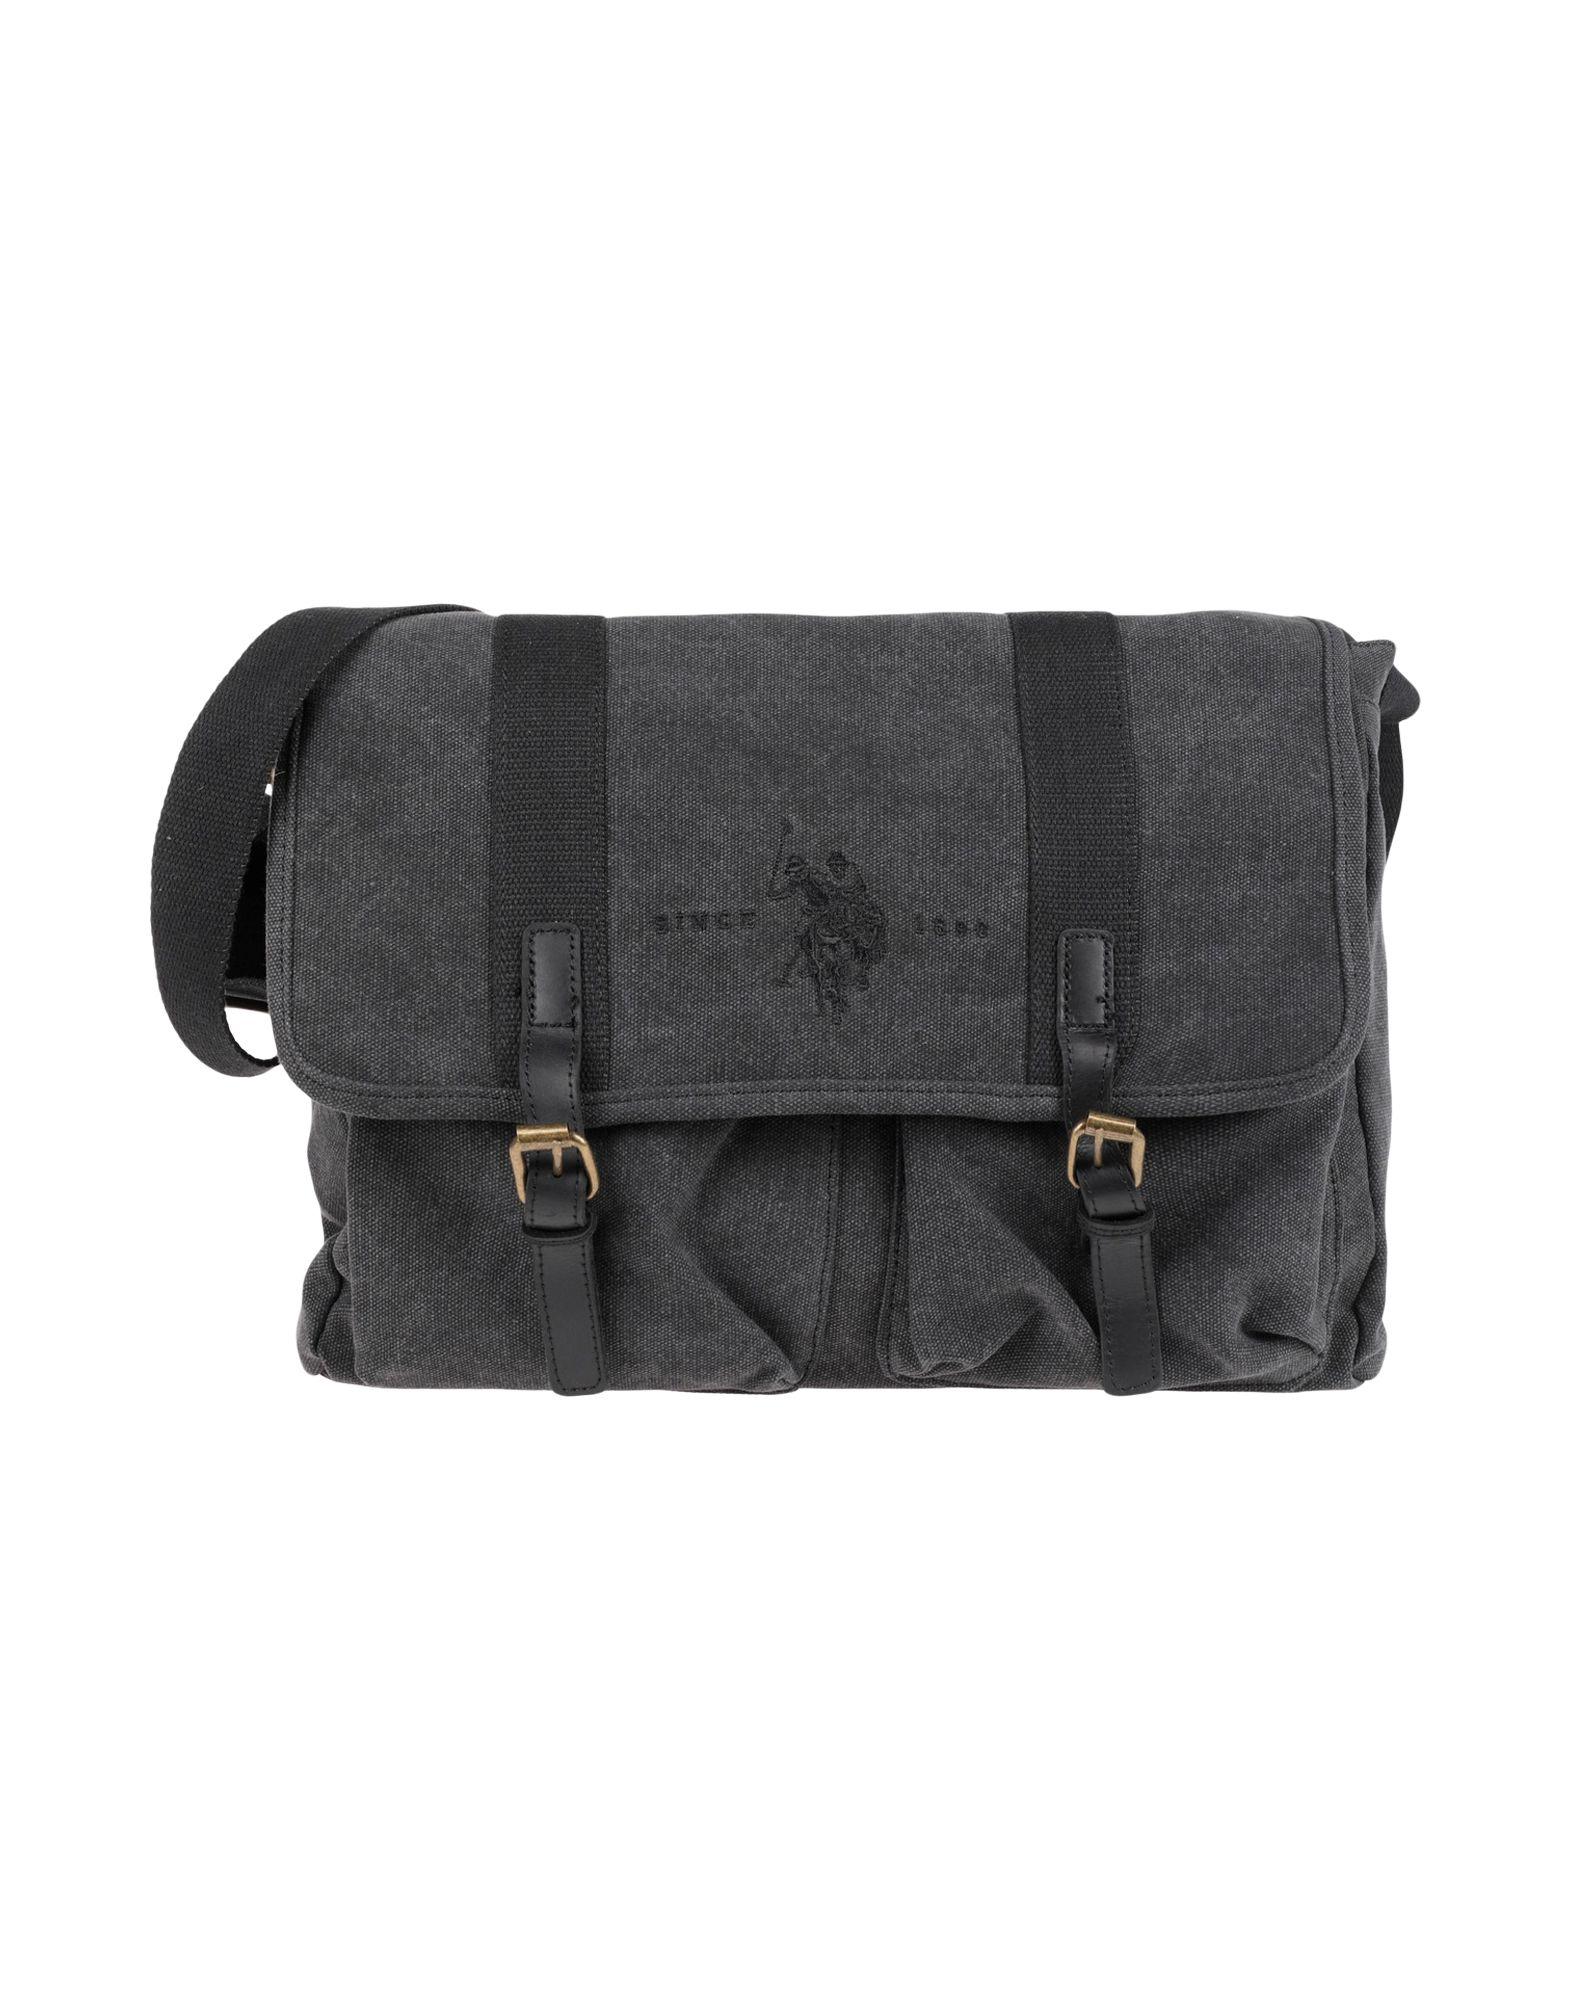 U.S.POLO ASSN. Деловые сумки